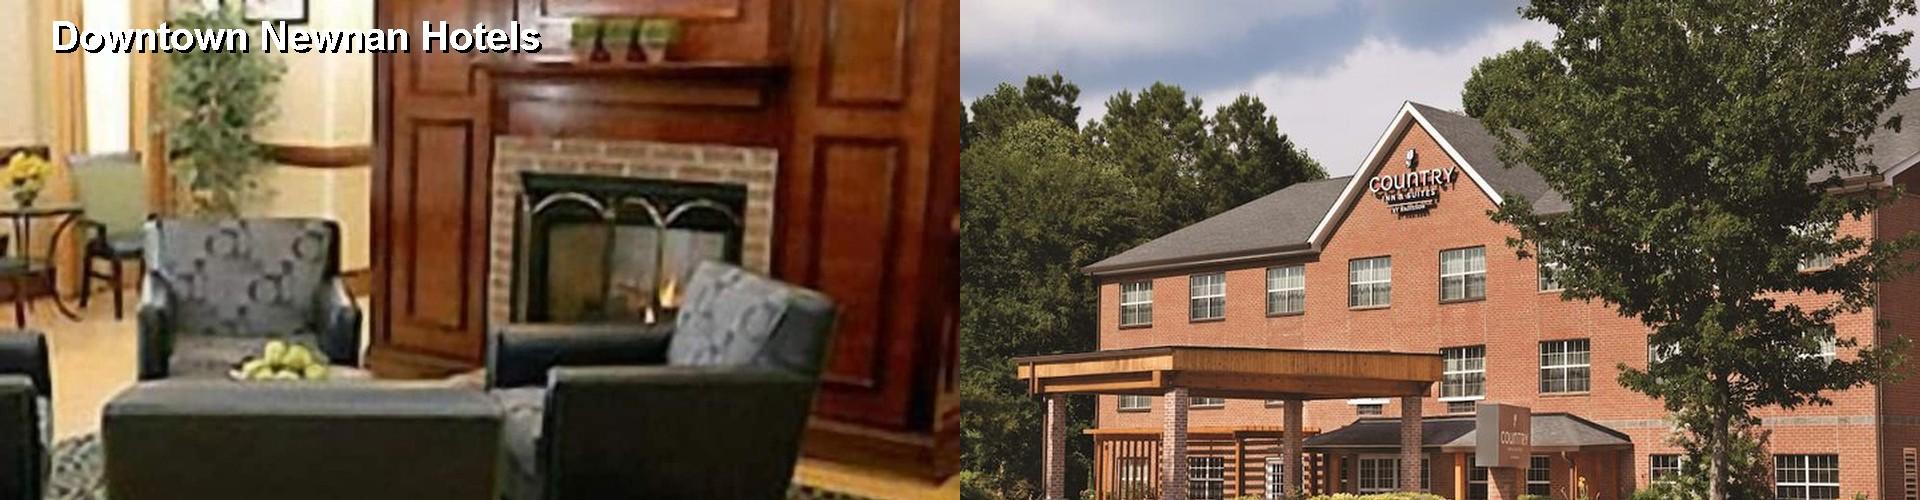 5 Best Hotels Near Downtown Newnan